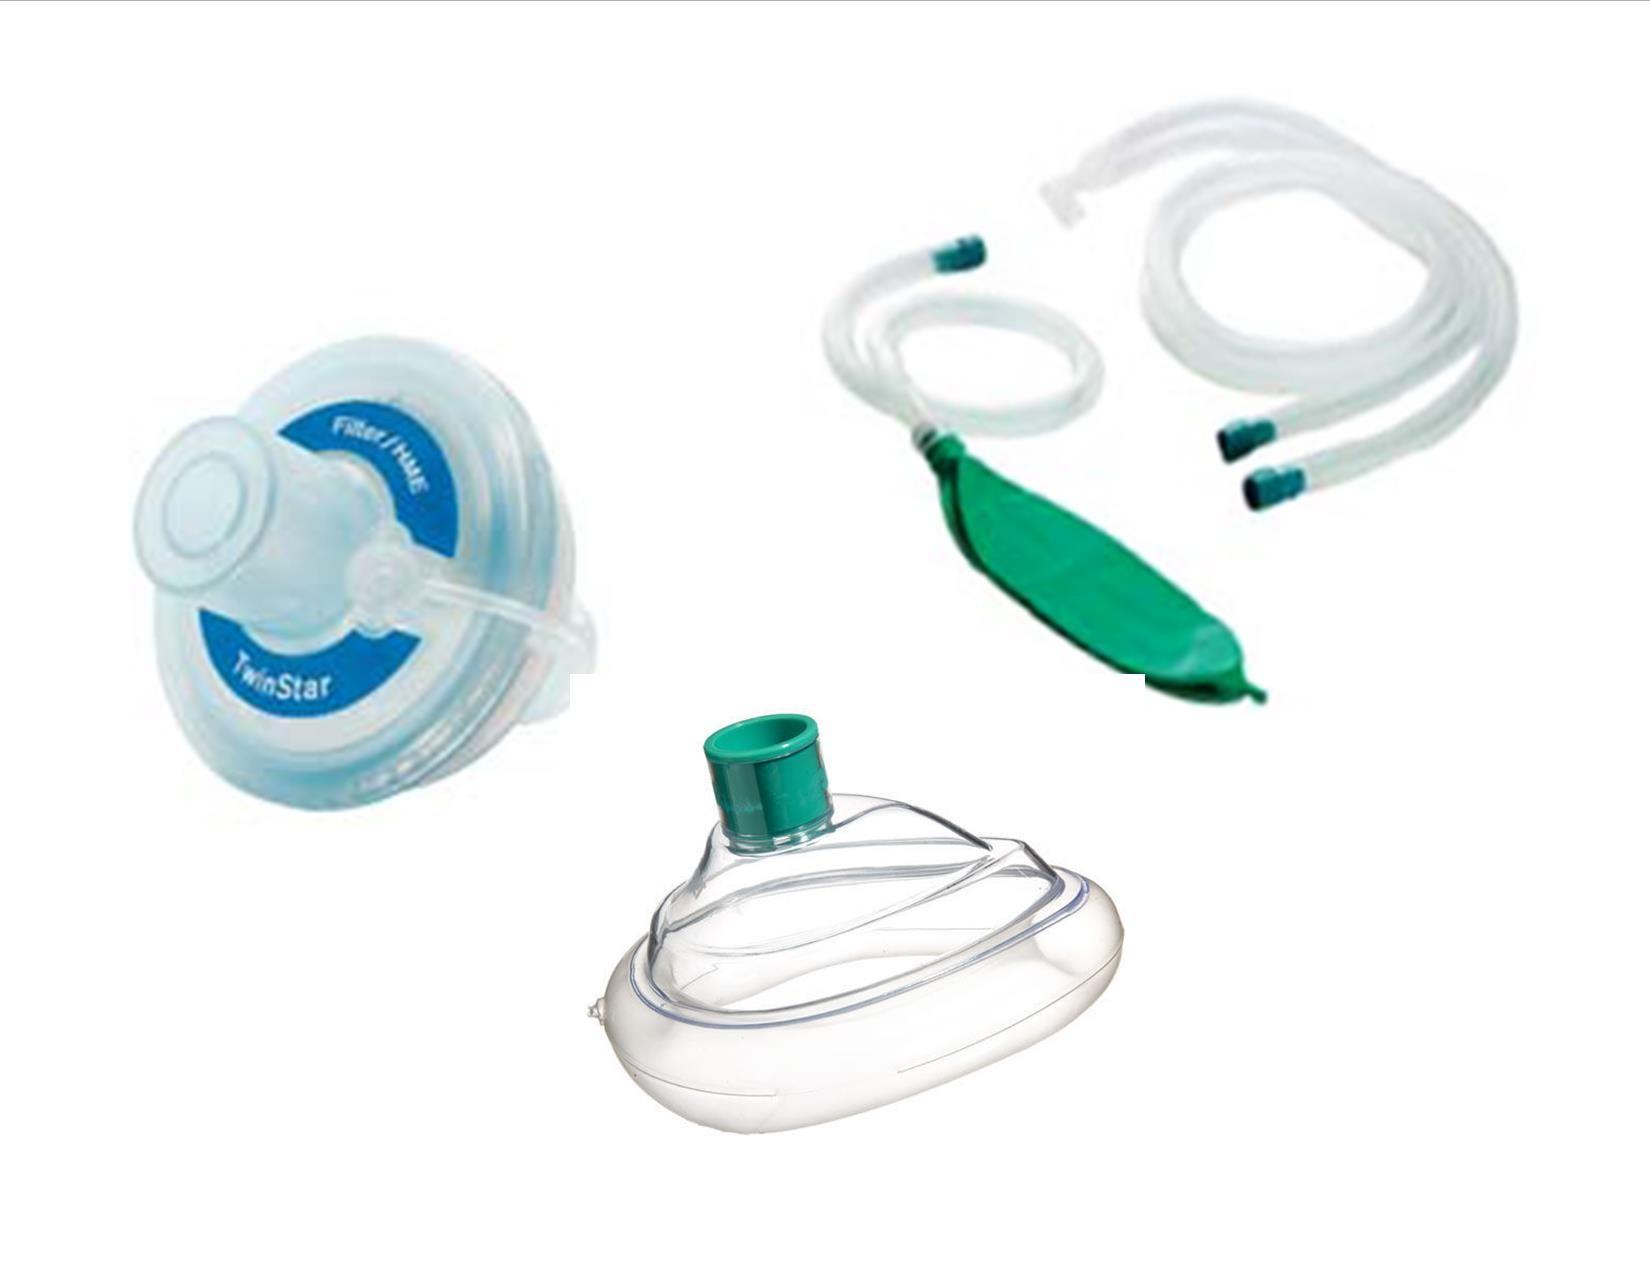 Circuito Bain : Circuito de anestesia ventstar sin latex desechable hospiinnova.com